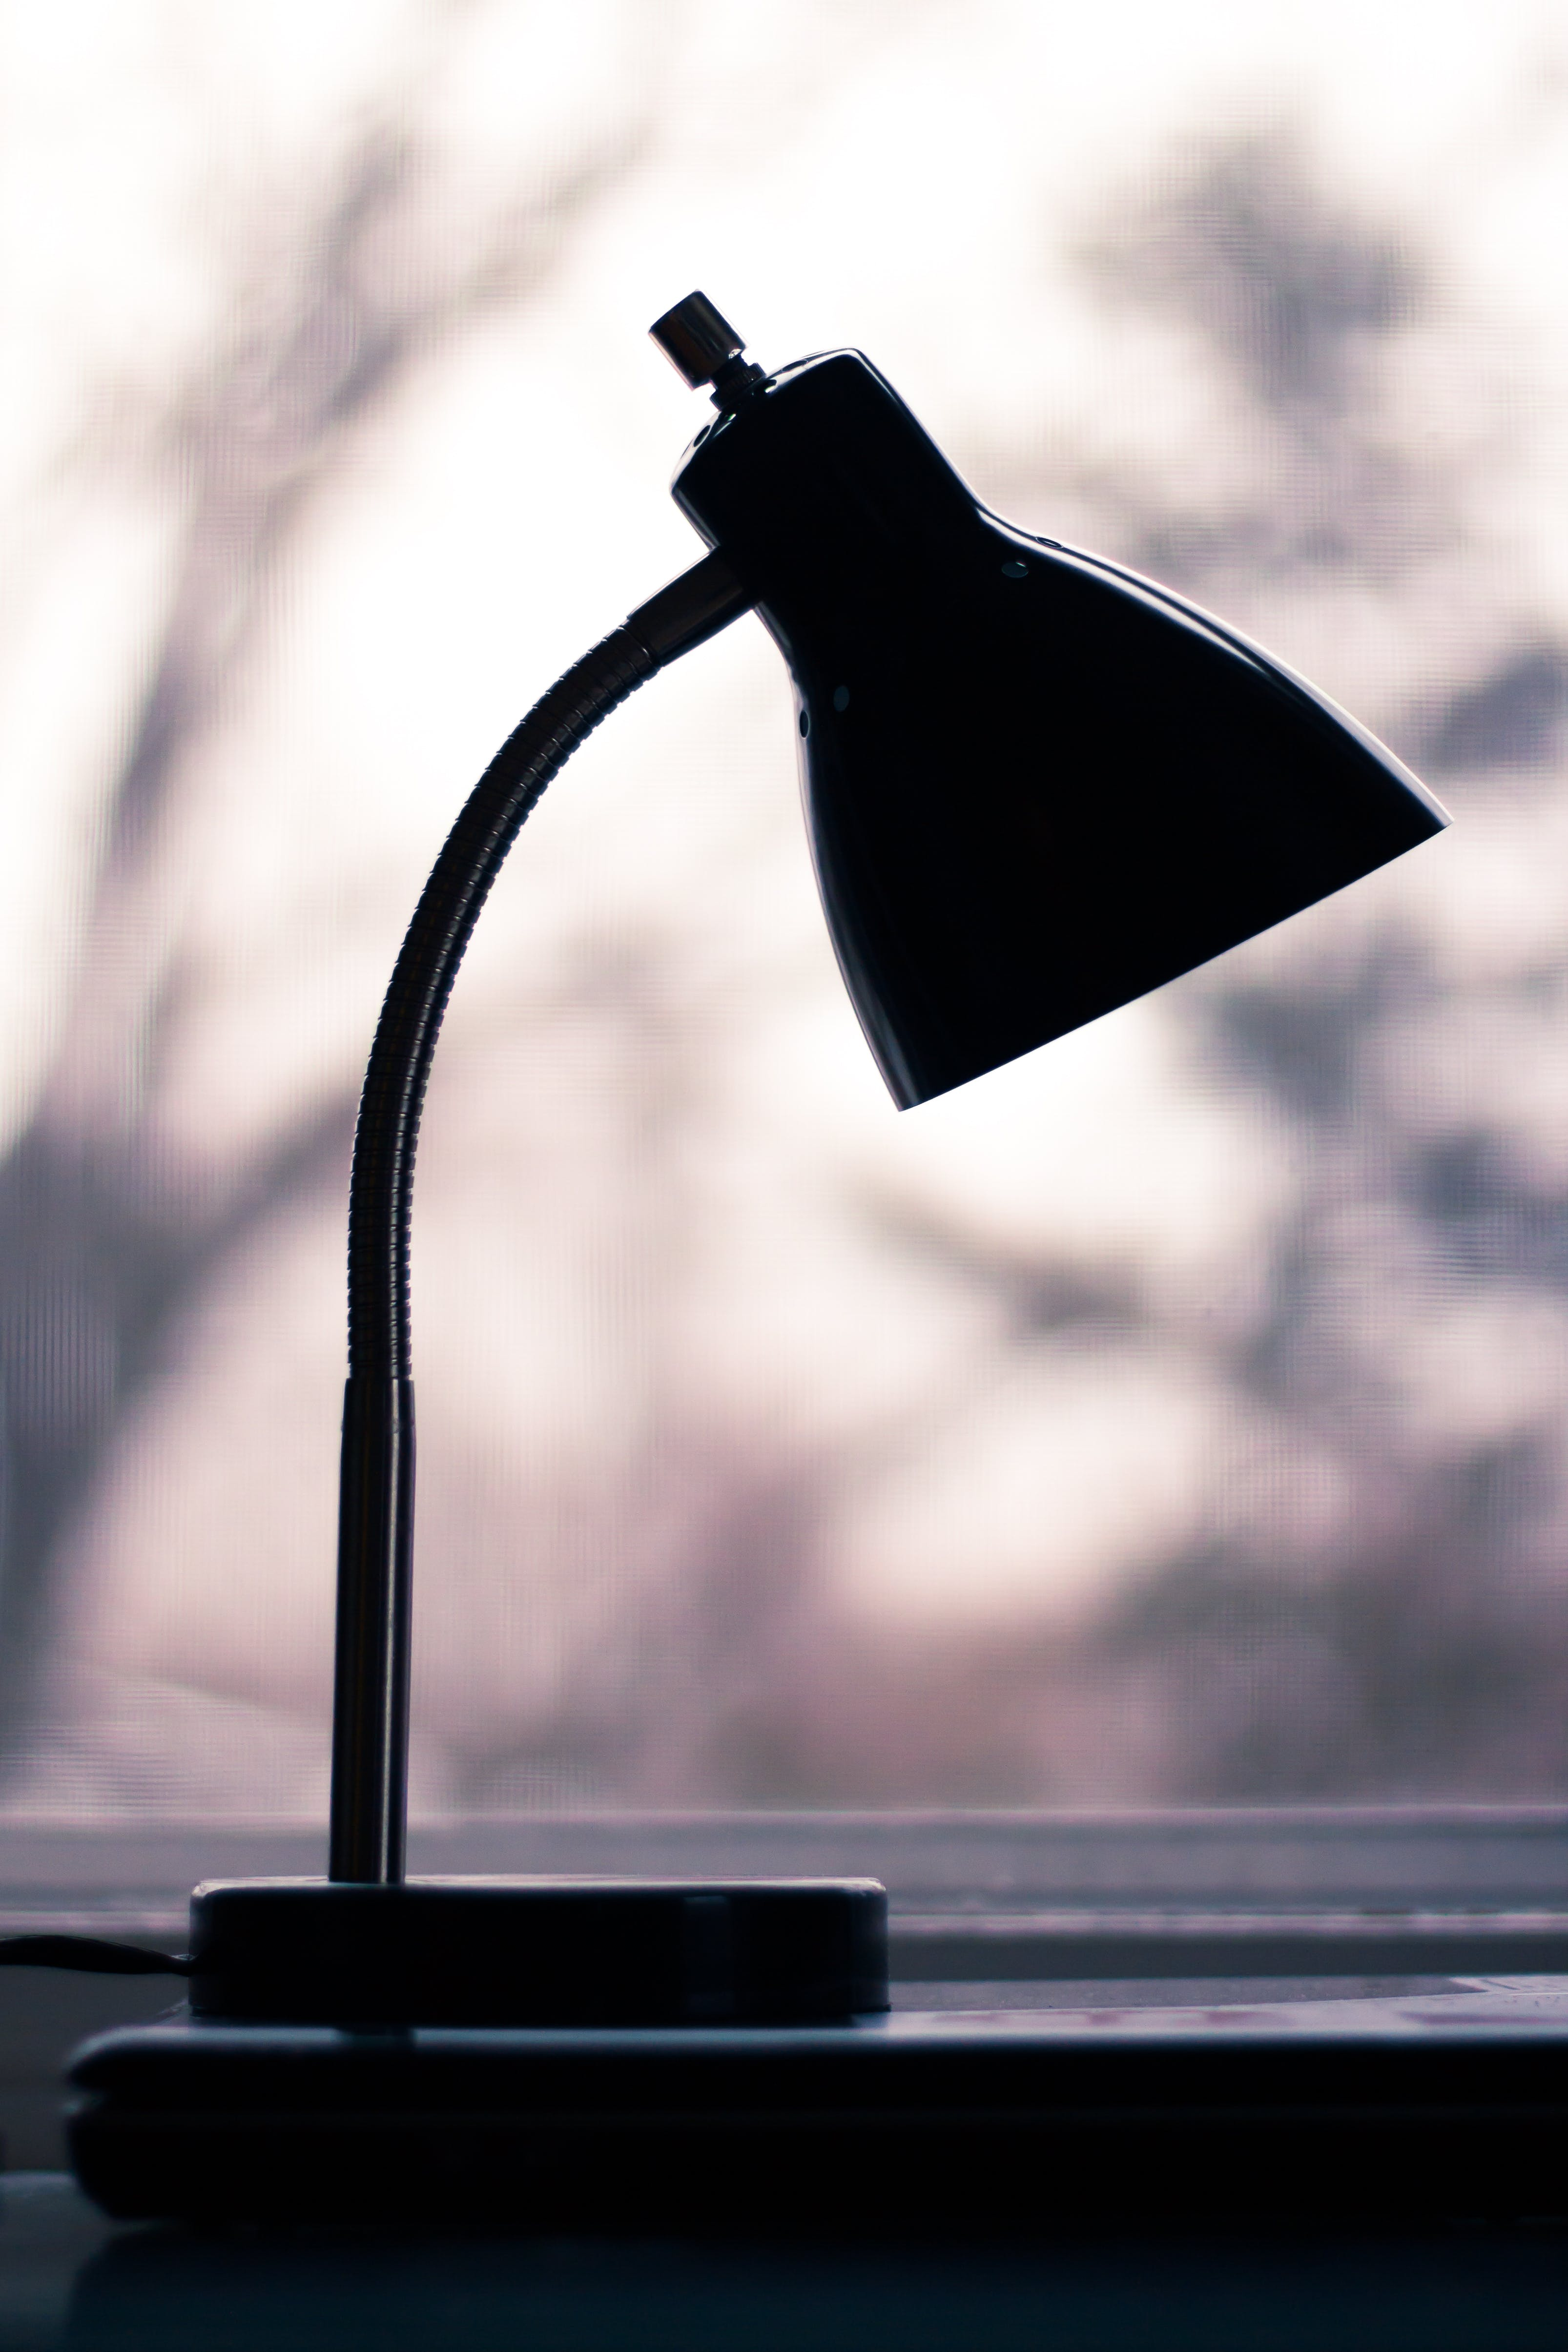 Silhouette of Black Desk Lamp